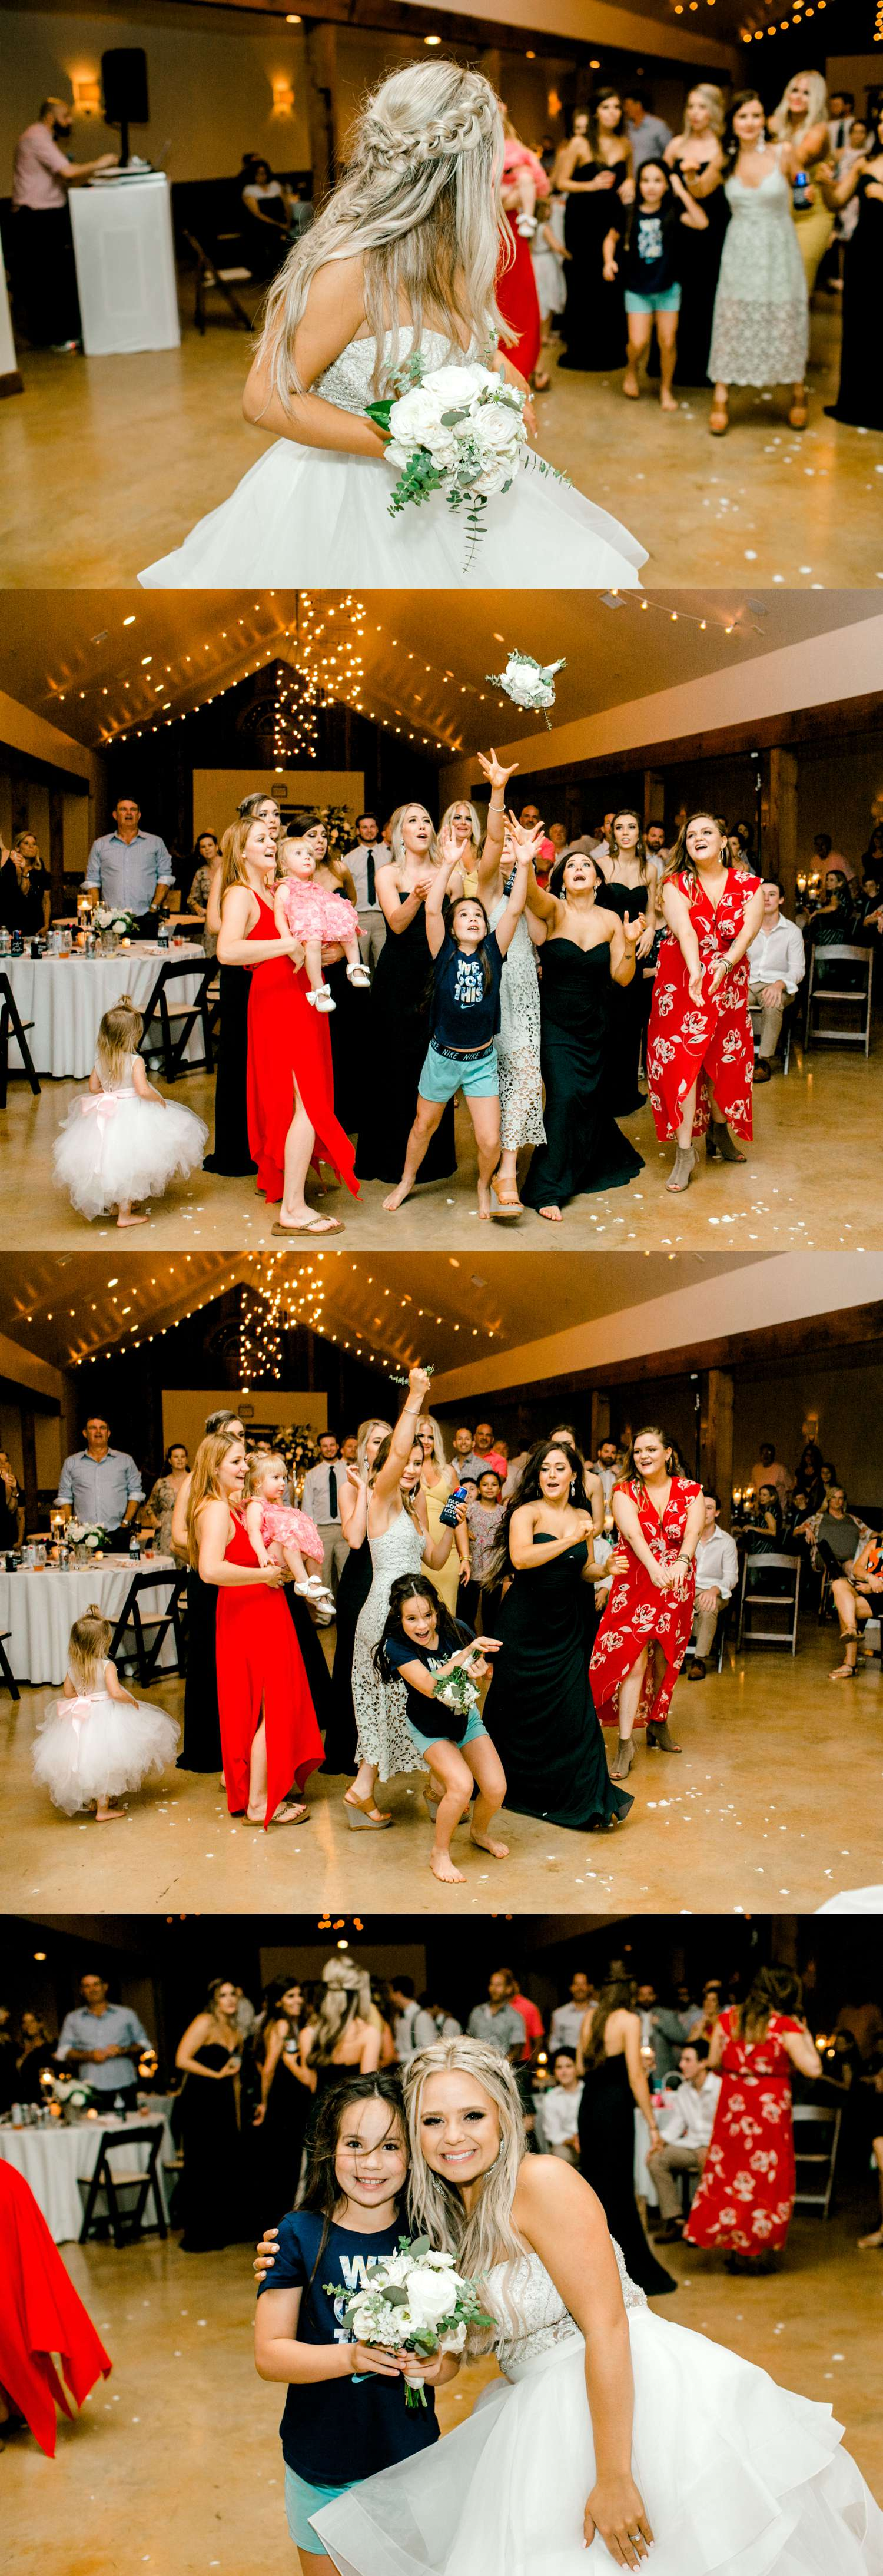 HAYLEE+JUSTIN+GREGORY+HERITAGE_HAUS_AUSTIN_TEXAS_WEDDING_0219.jpg